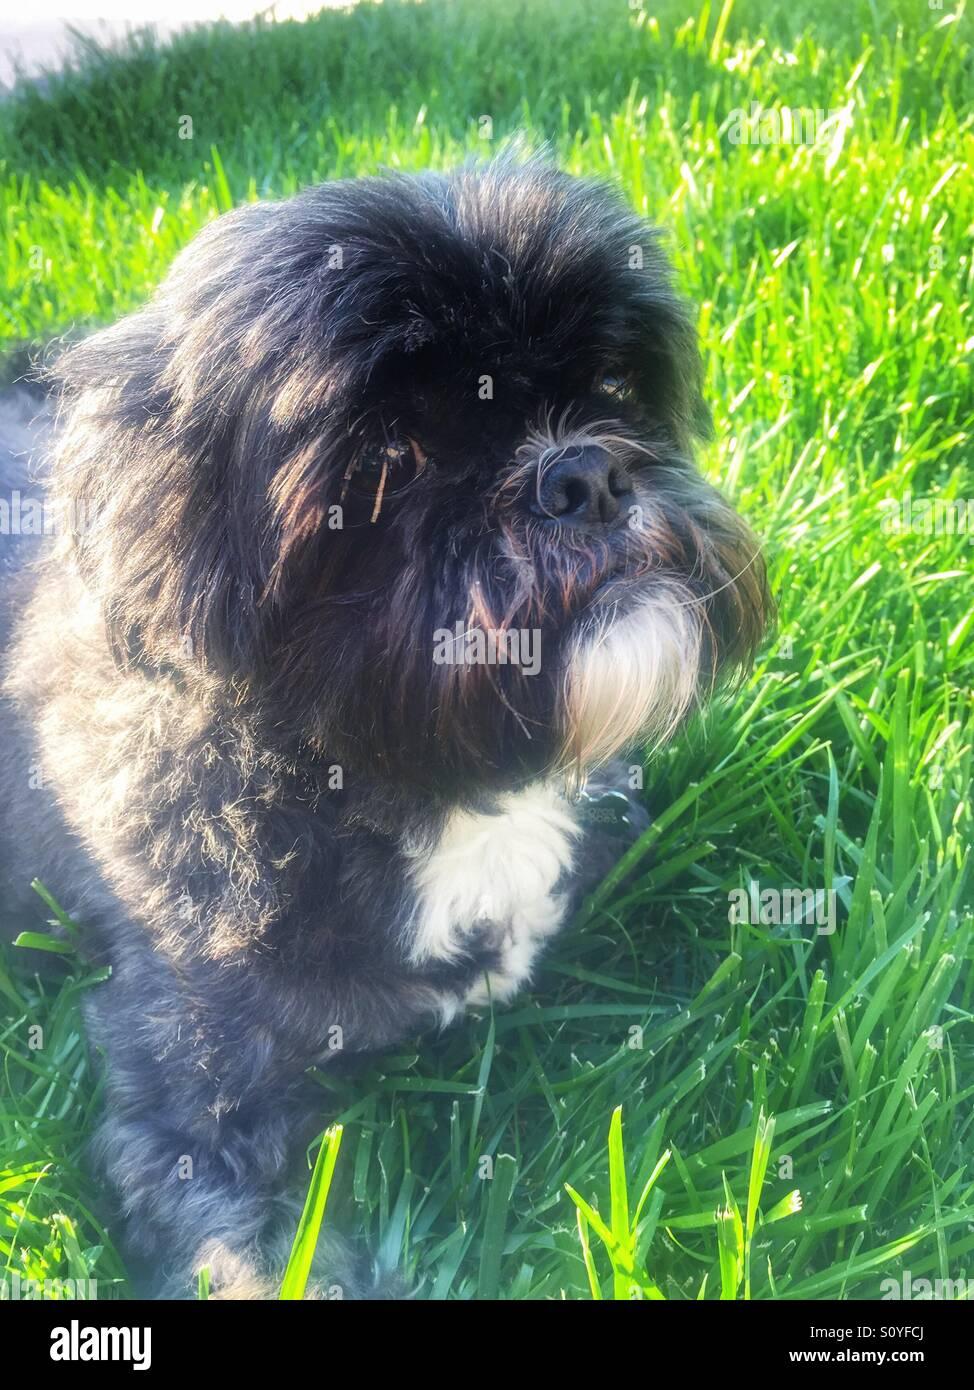 Stoic Shih Tzu dog lays in grass. - Stock Image